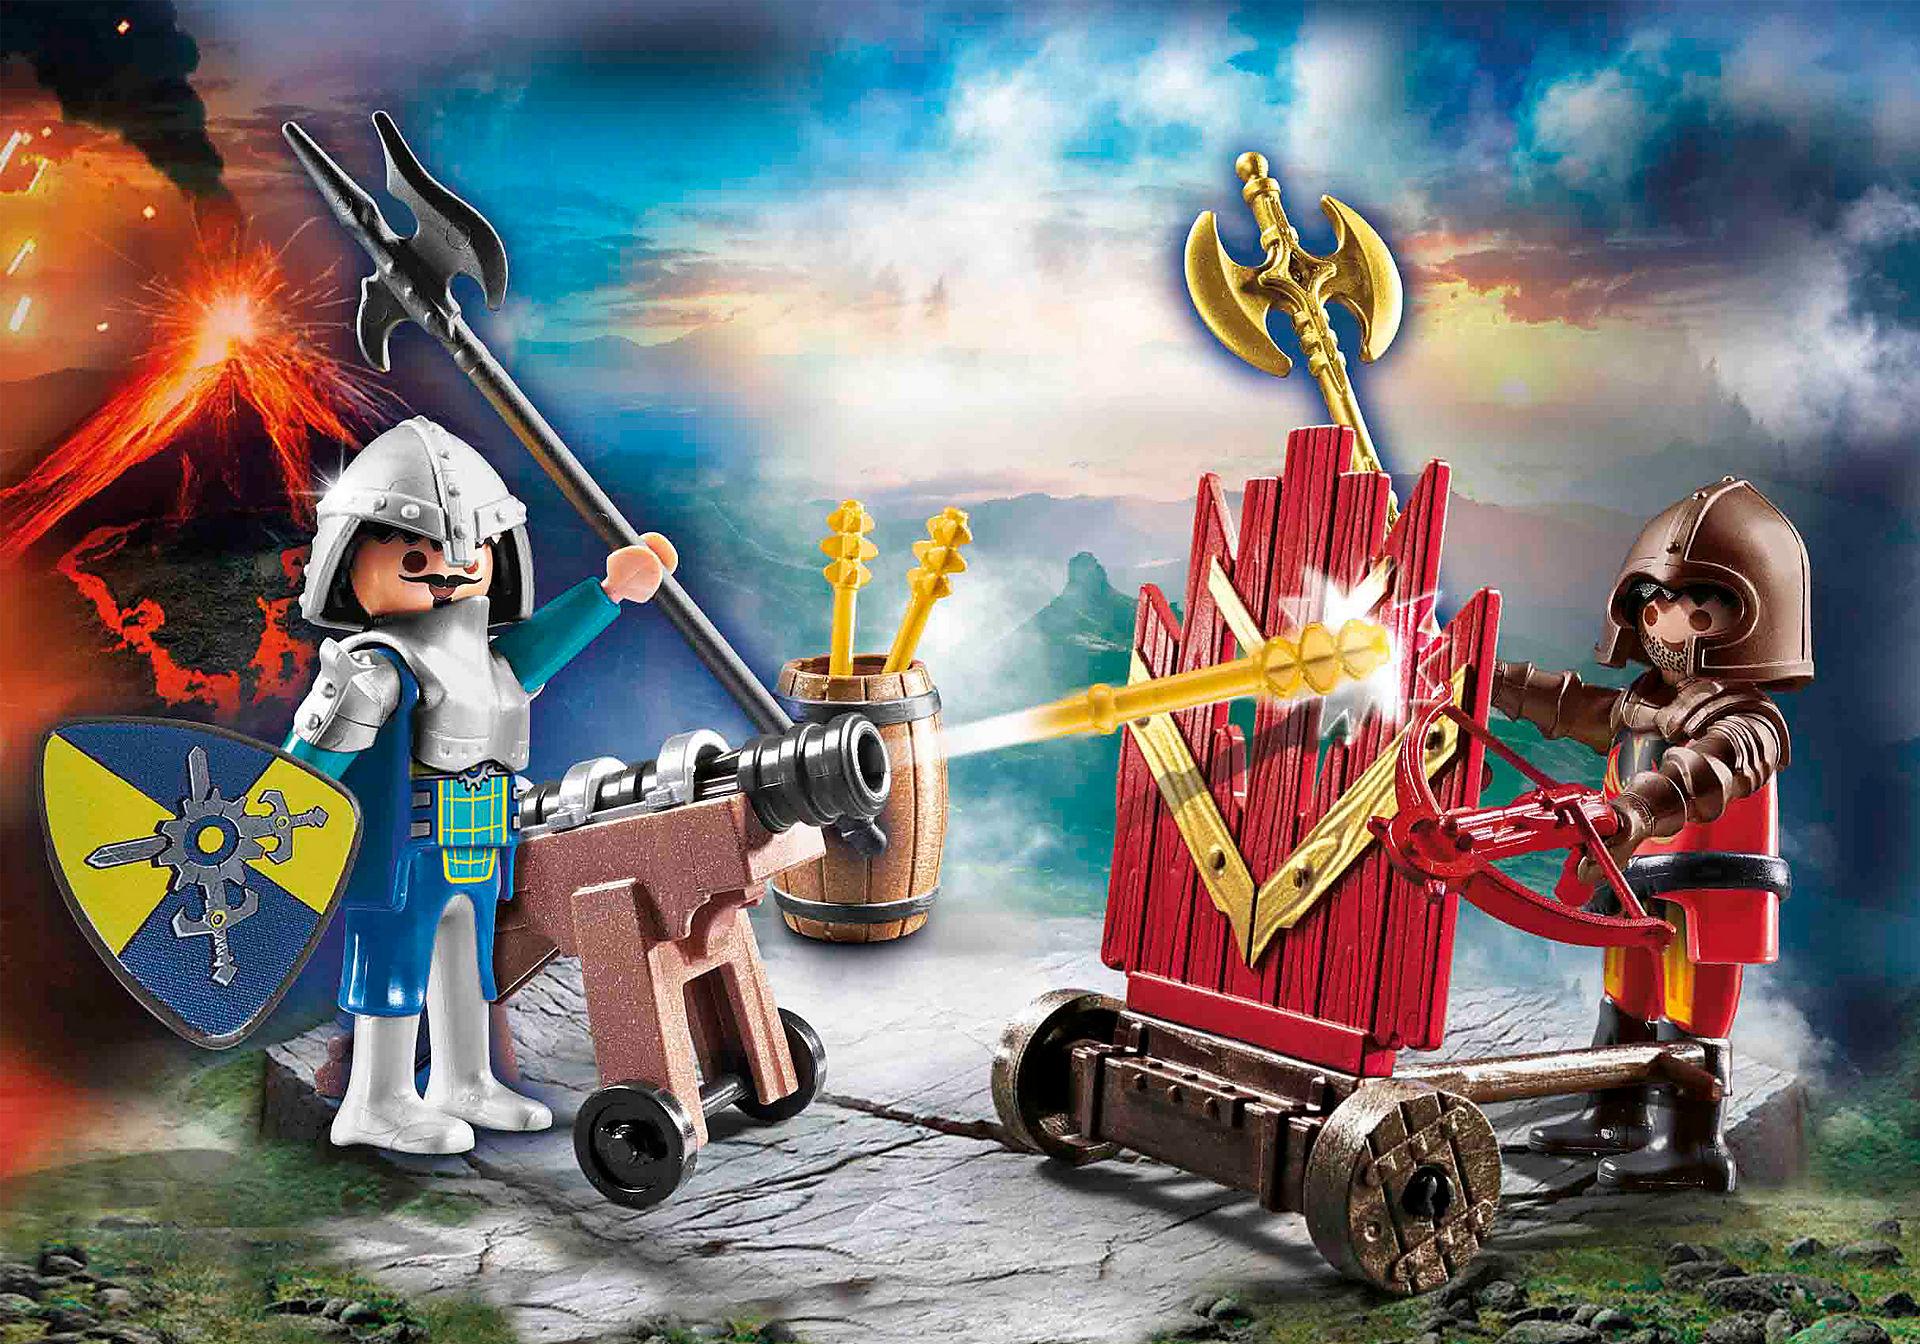 70503 Starter Pack Novelmore Knights' Duel zoom image1